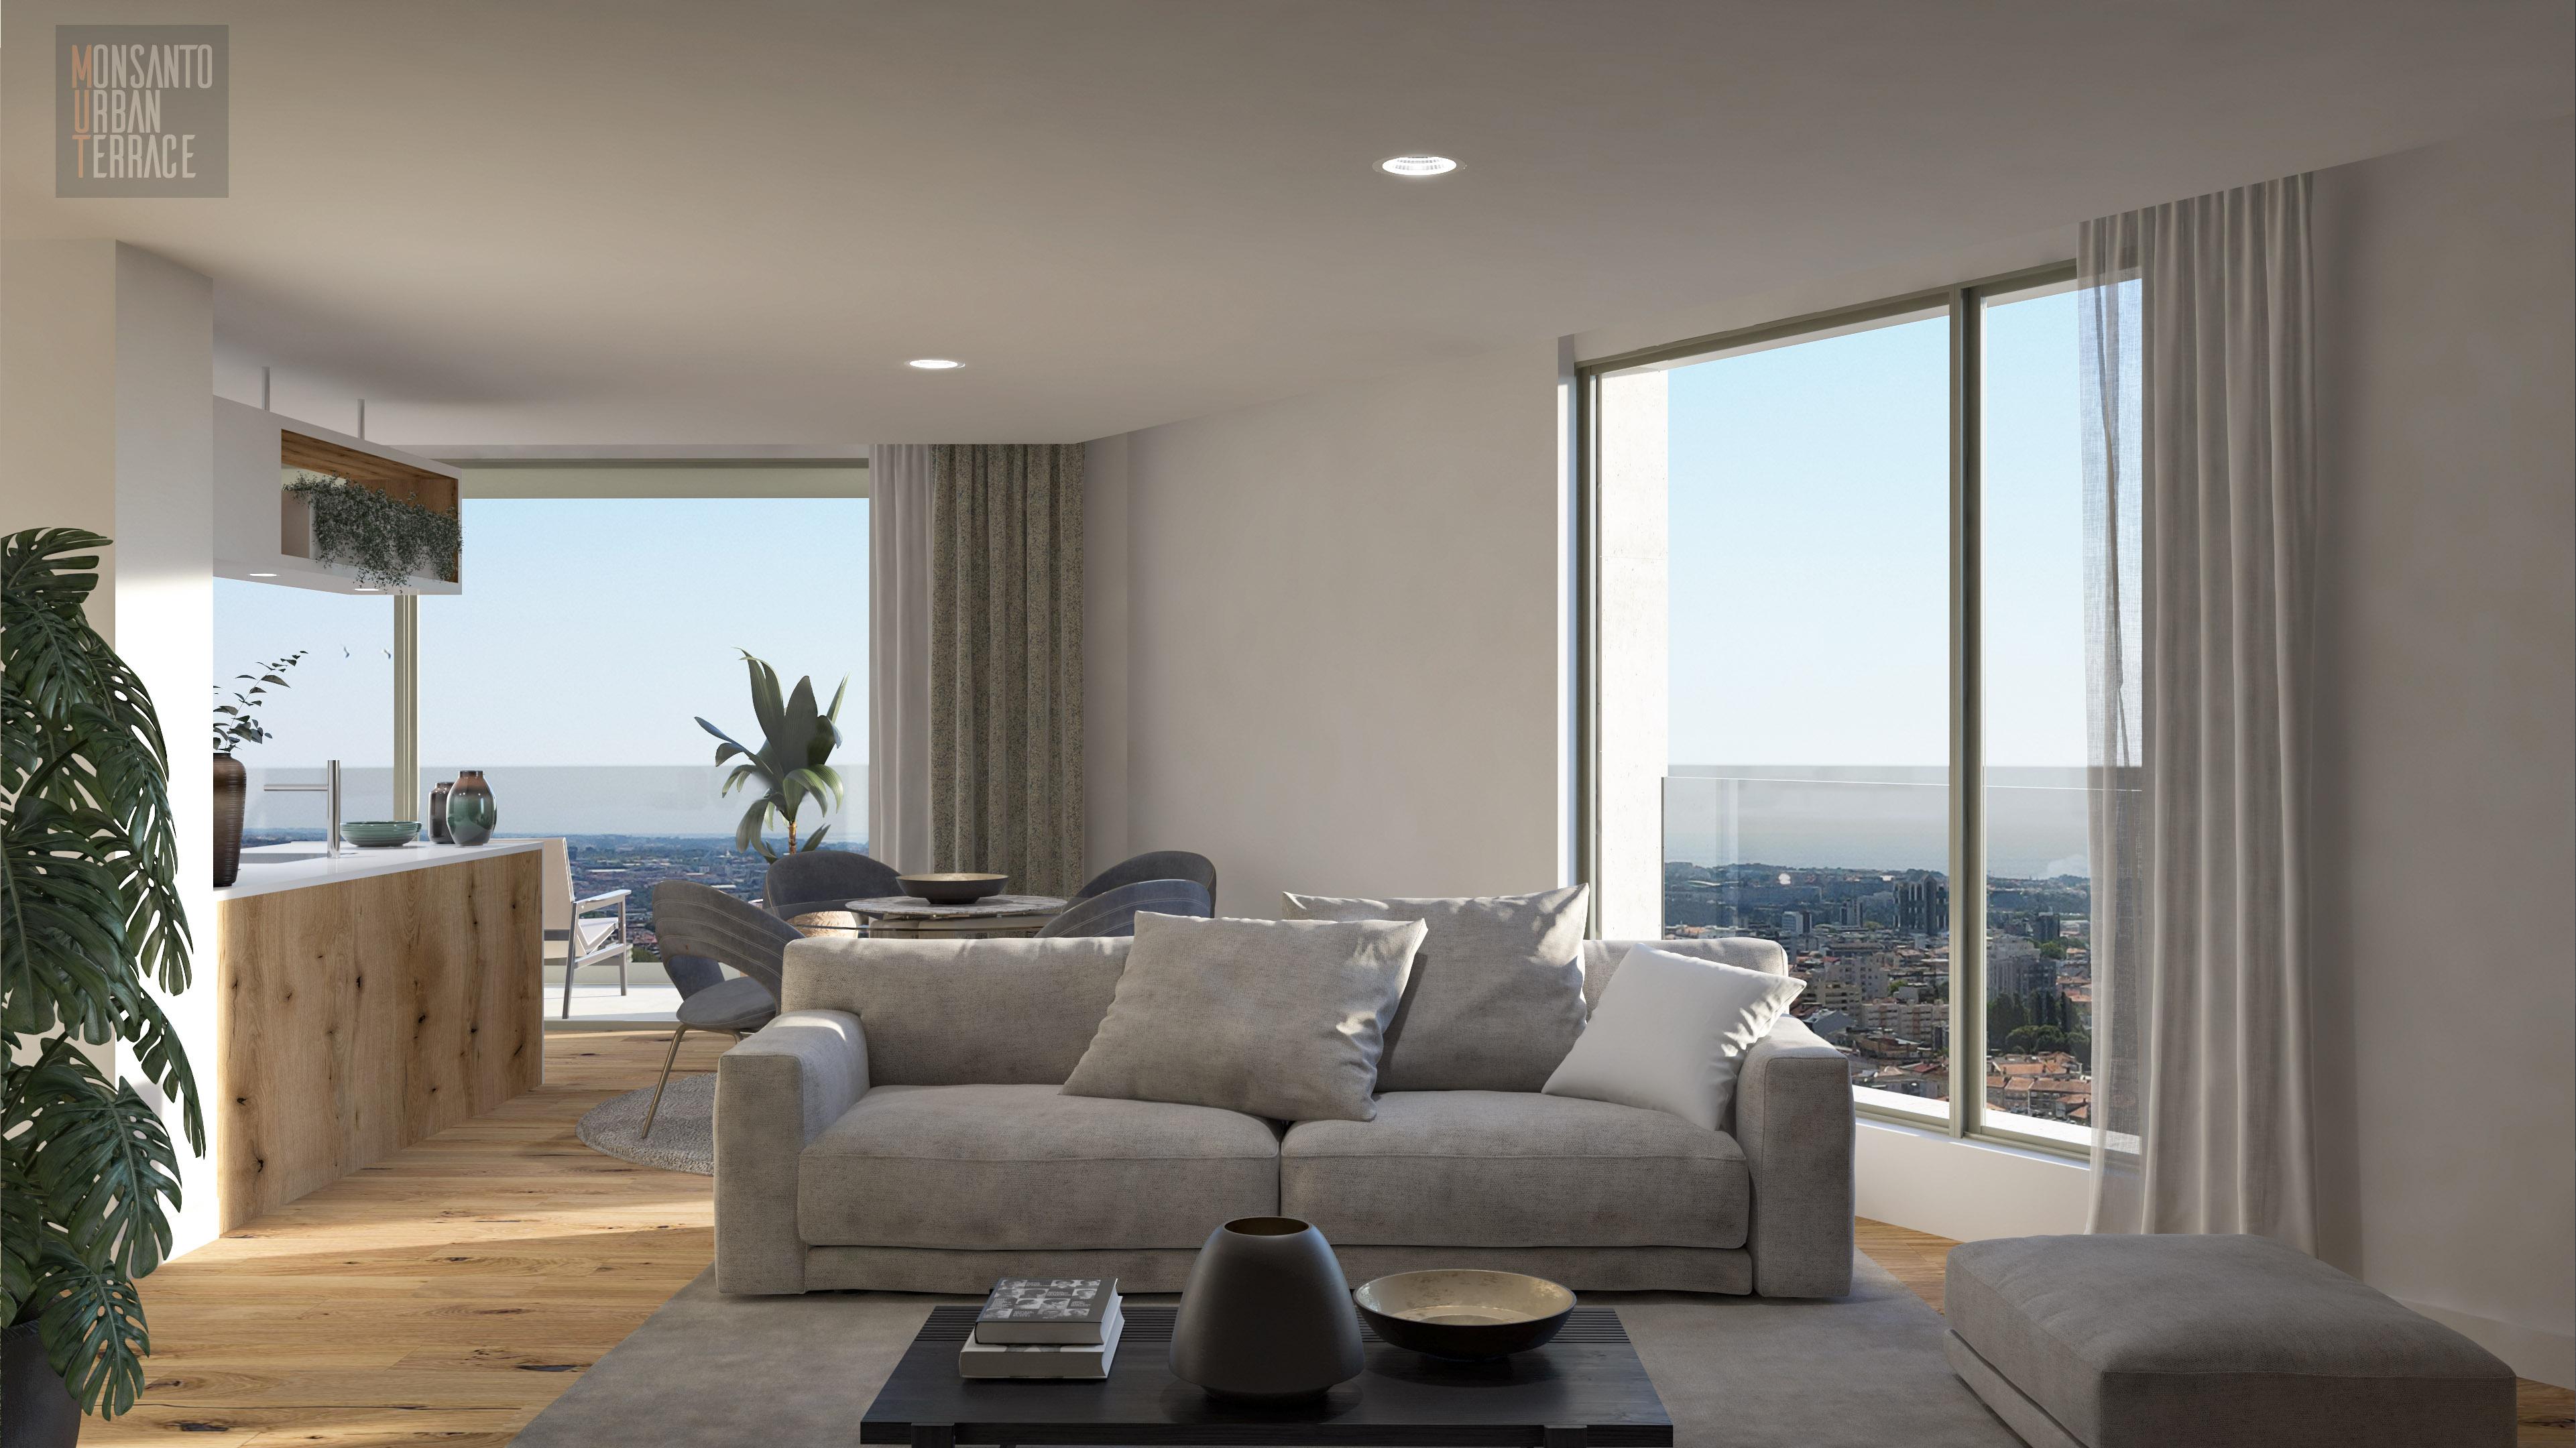 Monsanto Urban Terrace traz mais de 100 casas ao Porto